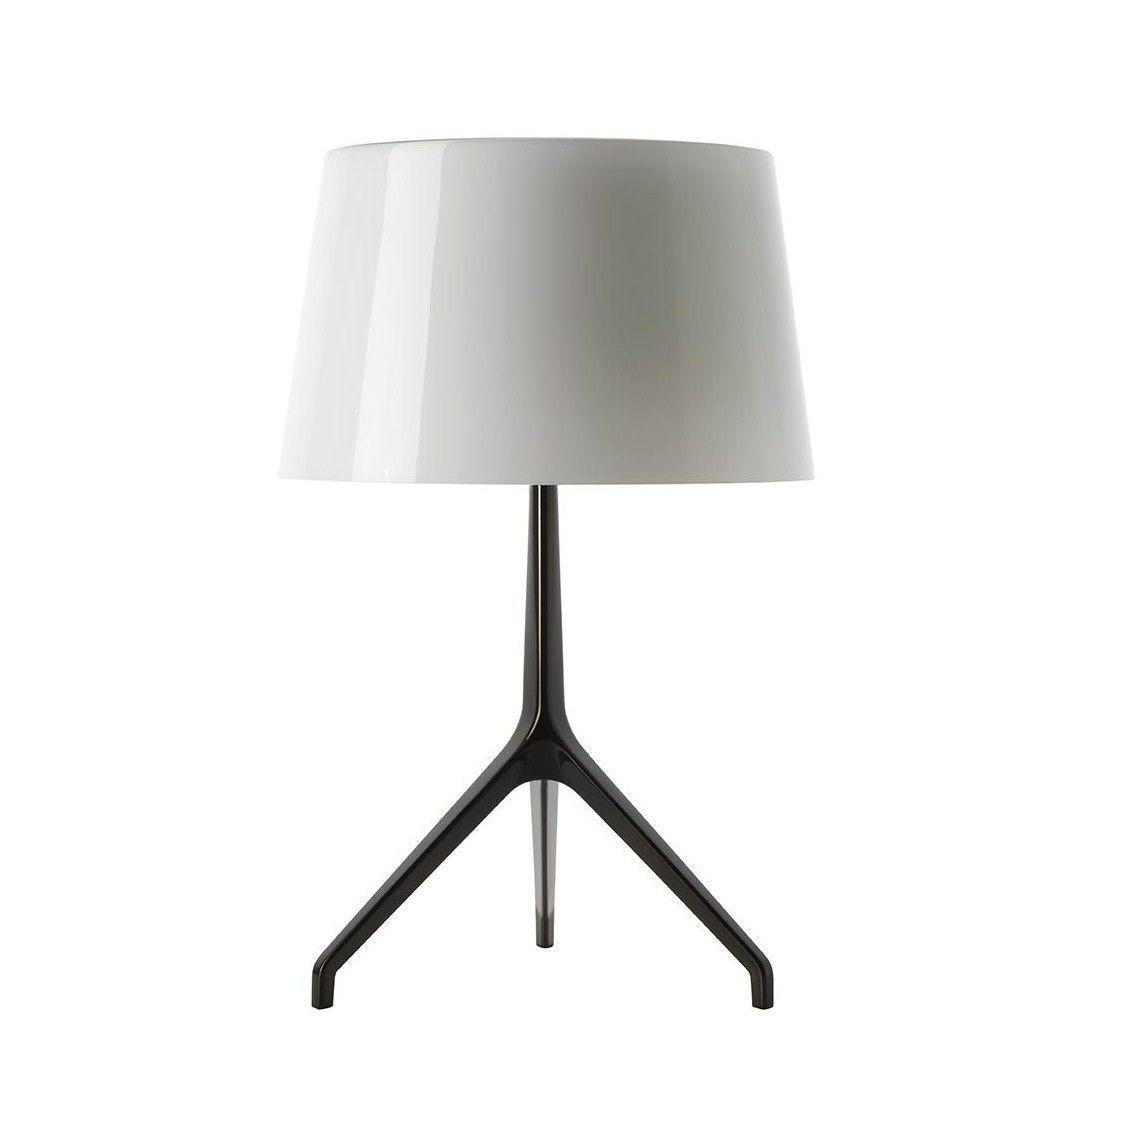 Lumiere xxs chrome table lamp foscarini - Foscarini lumiere table lamp ...